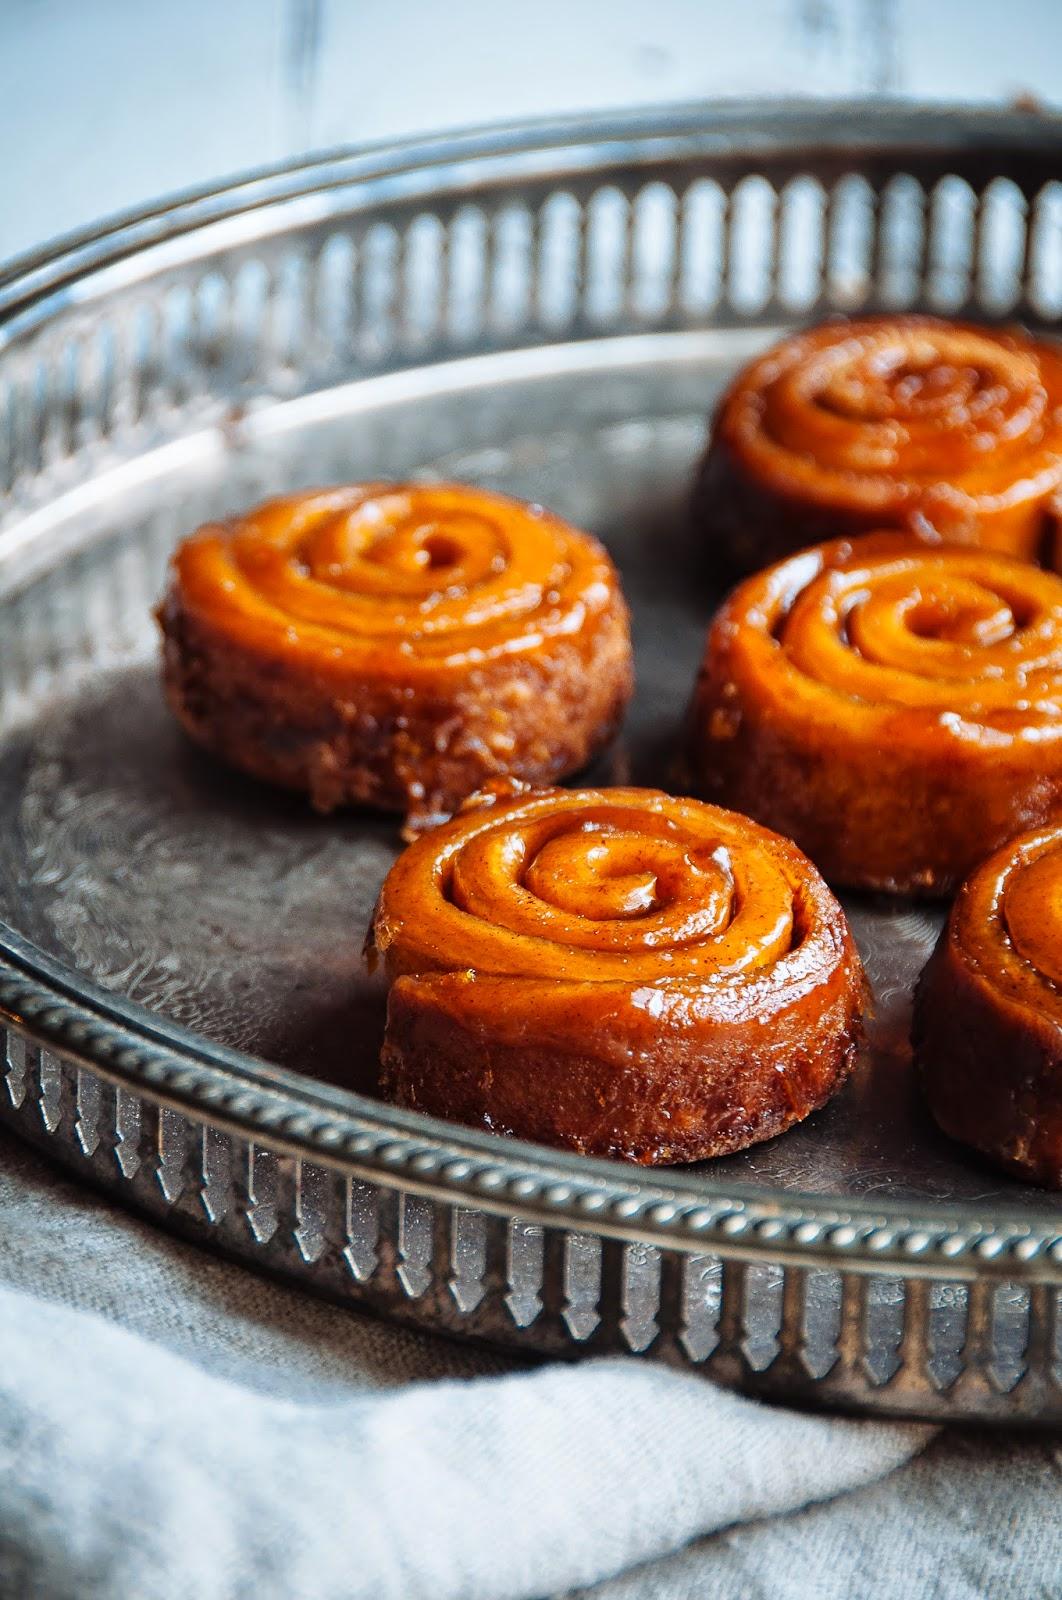 Fresh Homemade Cinnamon Sticky Buns Royalty Free Stock ...  Cinnamon Sticky Buns